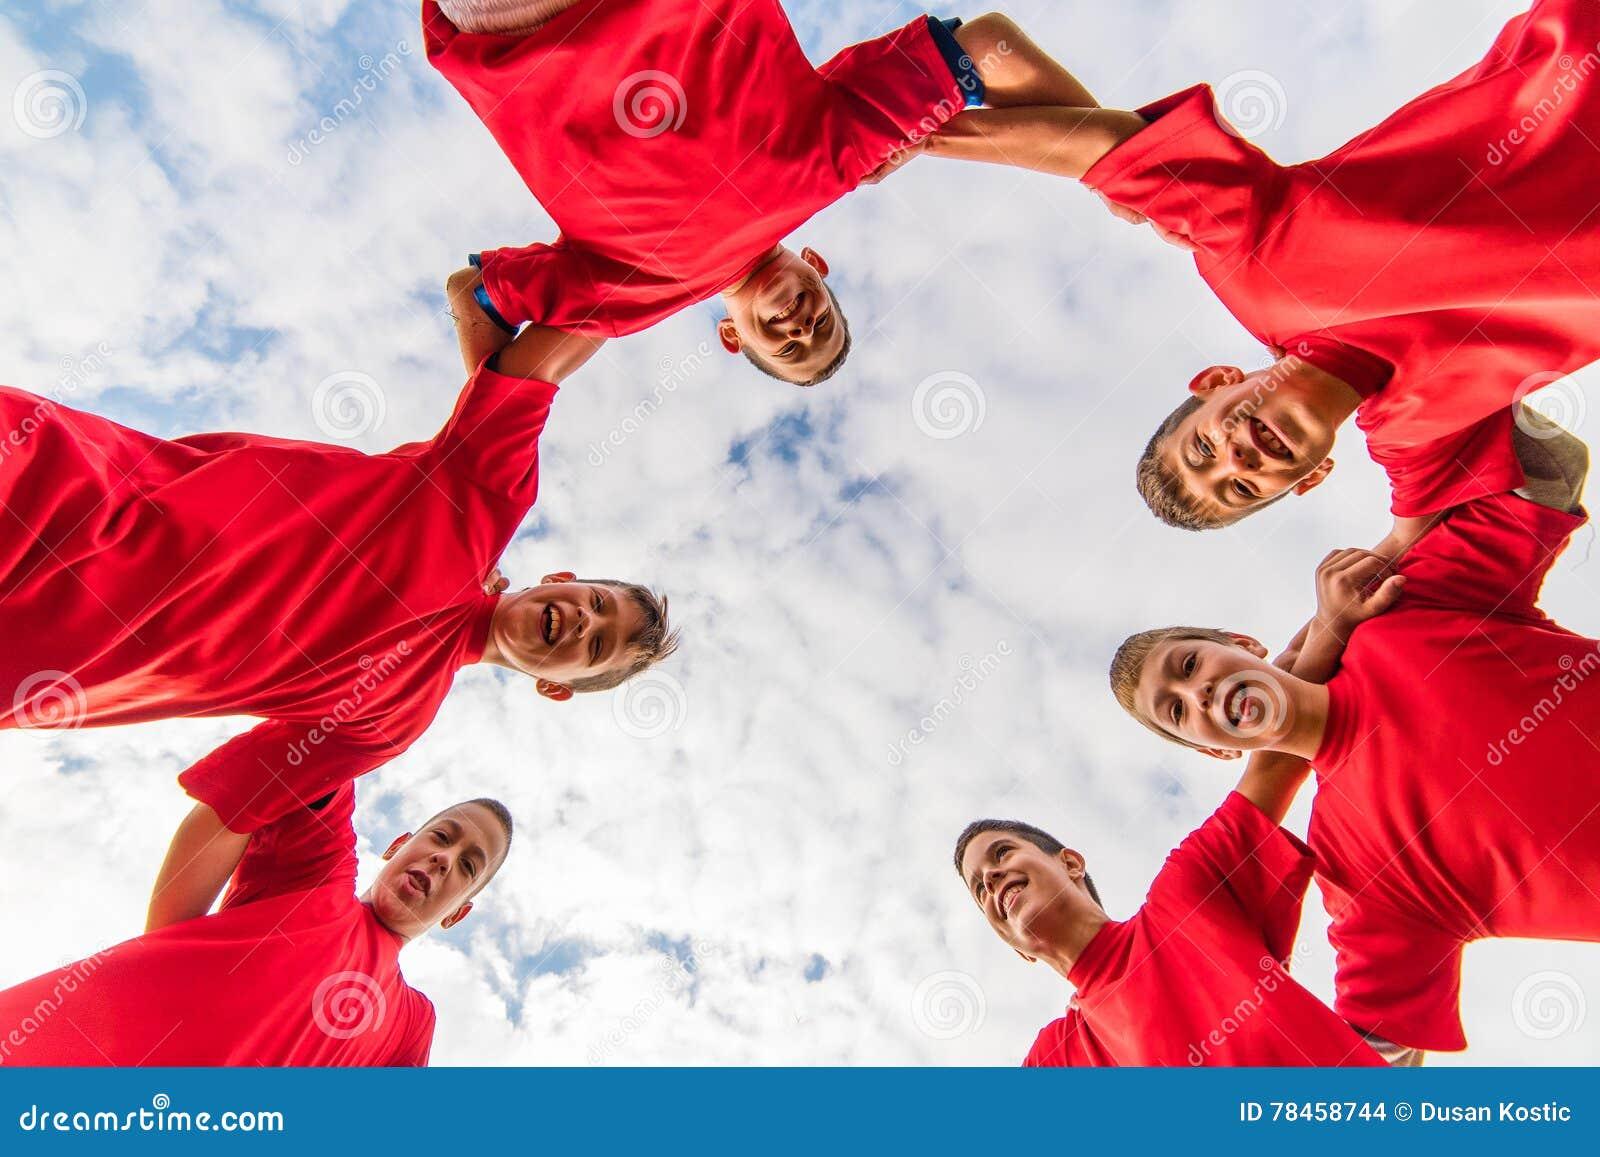 fe975d40651 Kids soccer team in huddle stock photo. Image of boys - 78458744